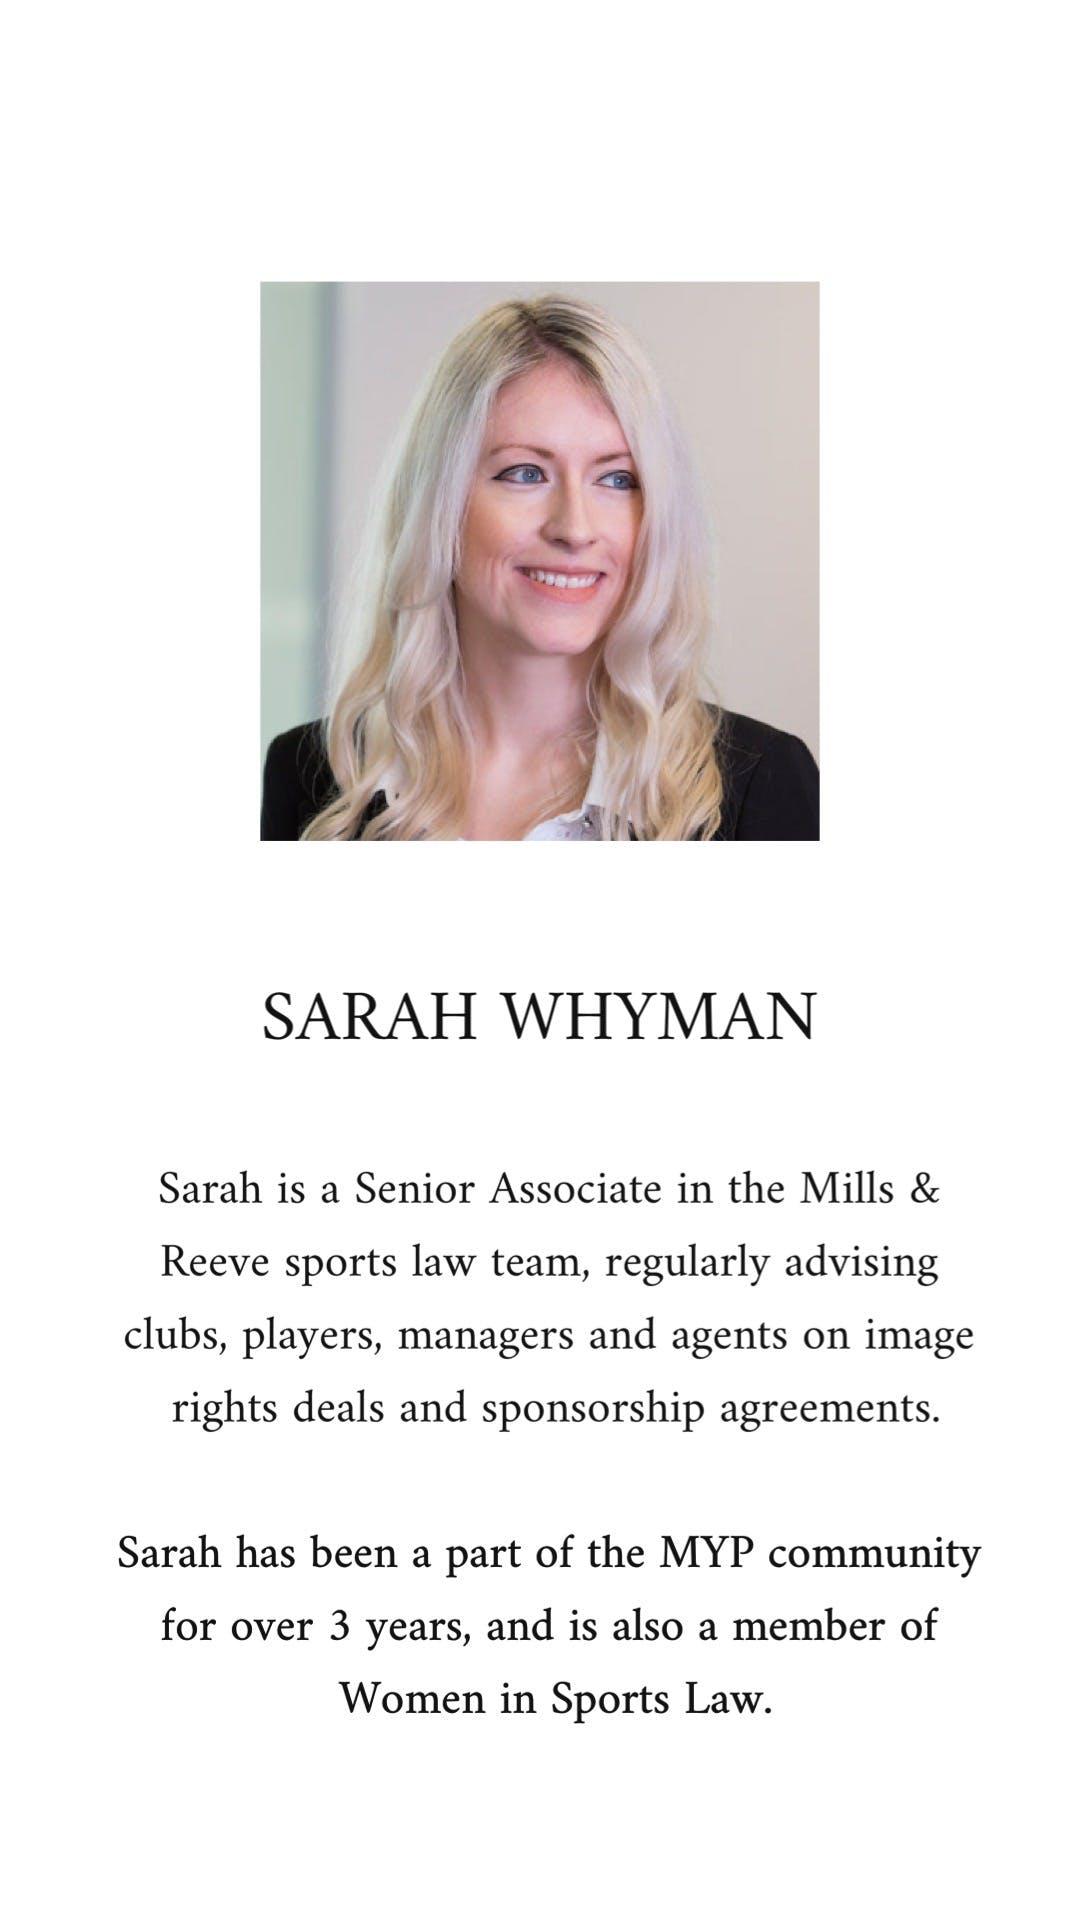 sarah whyman bio